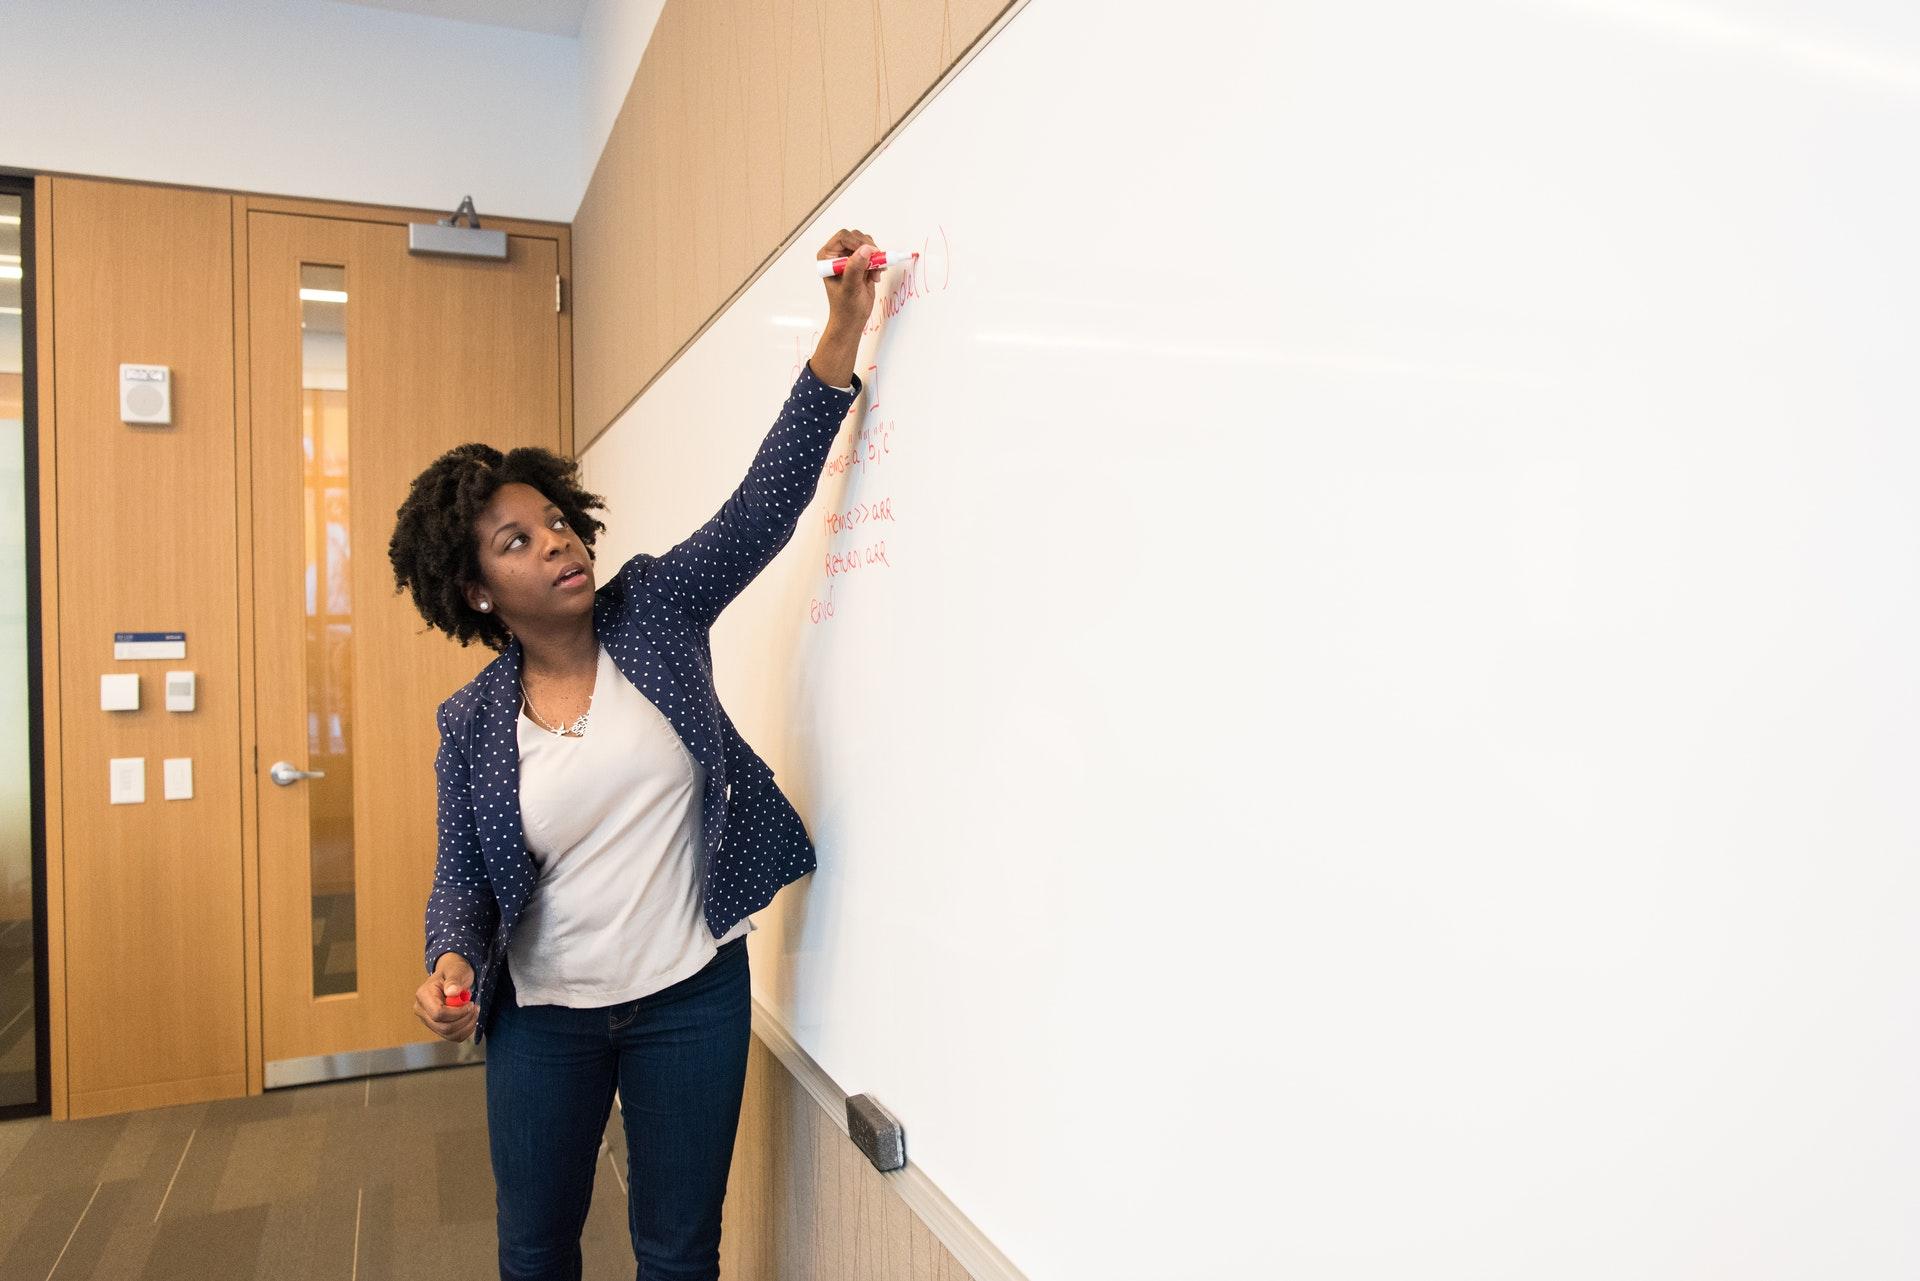 Why Teachers Should Take a Step Back